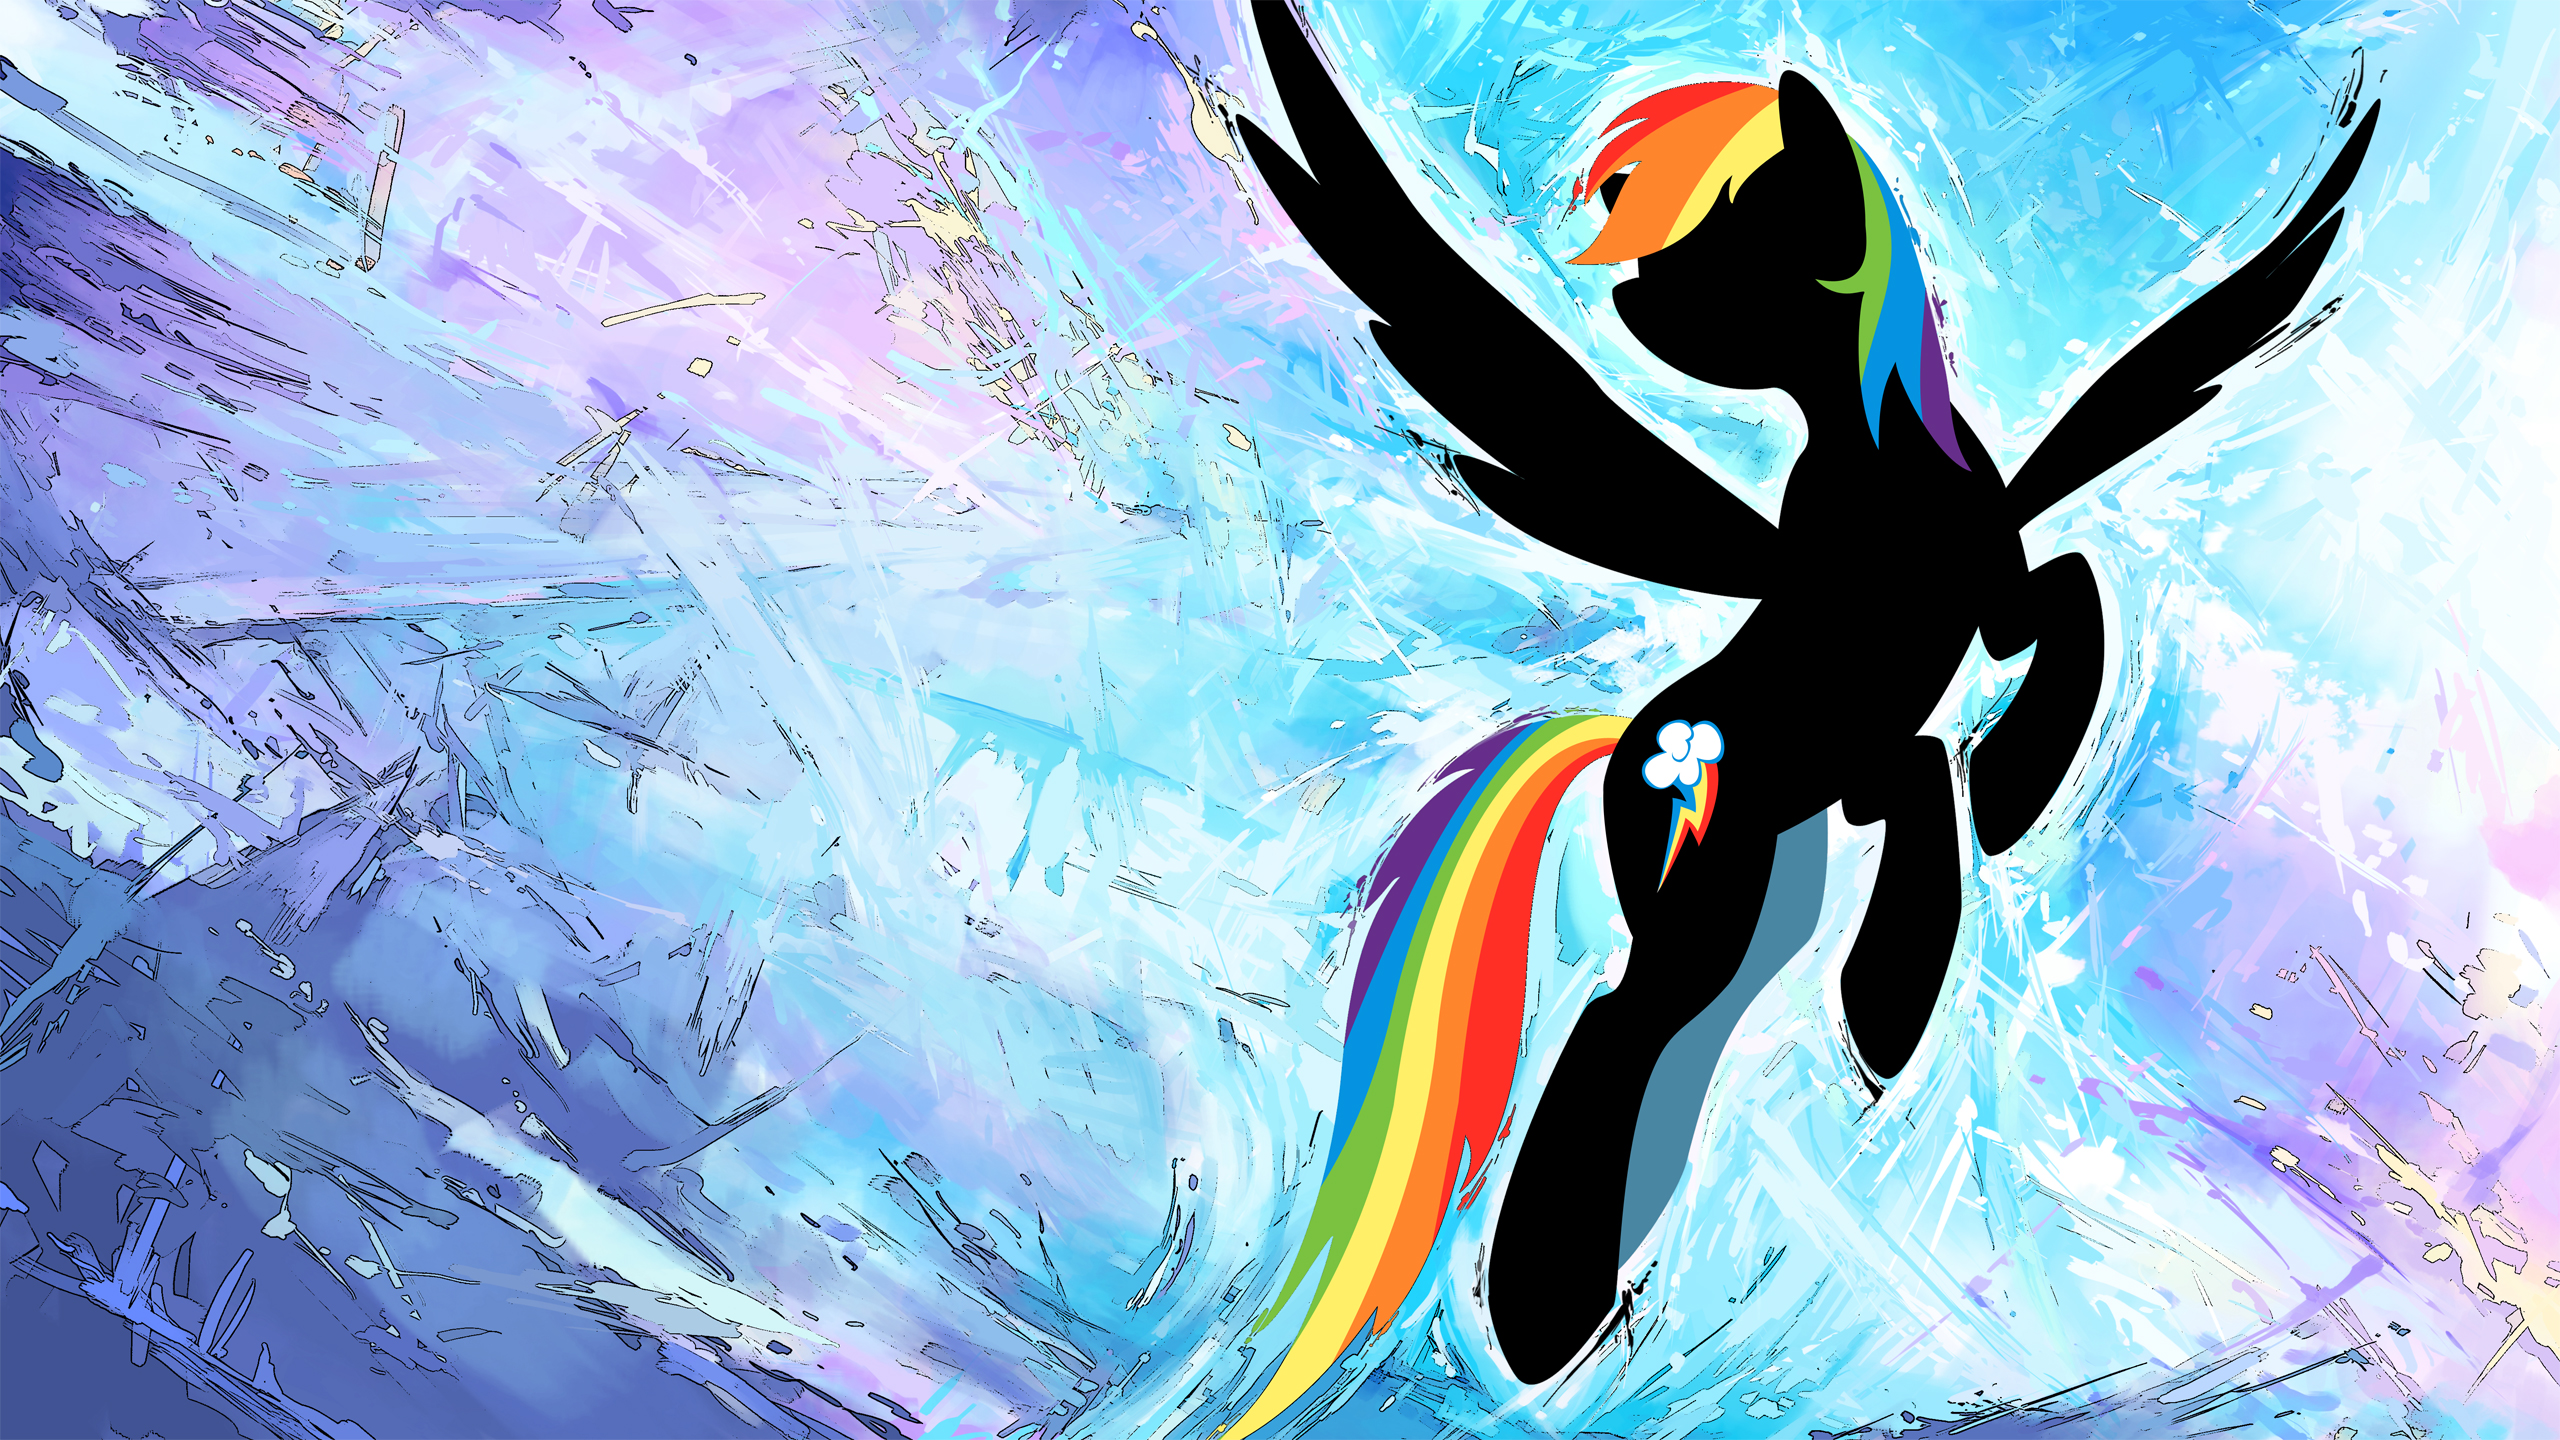 Friendship Quotes Wallpapers Free Download For Desktop Rainbow Dash Wallpaper High Quality Pixelstalk Net